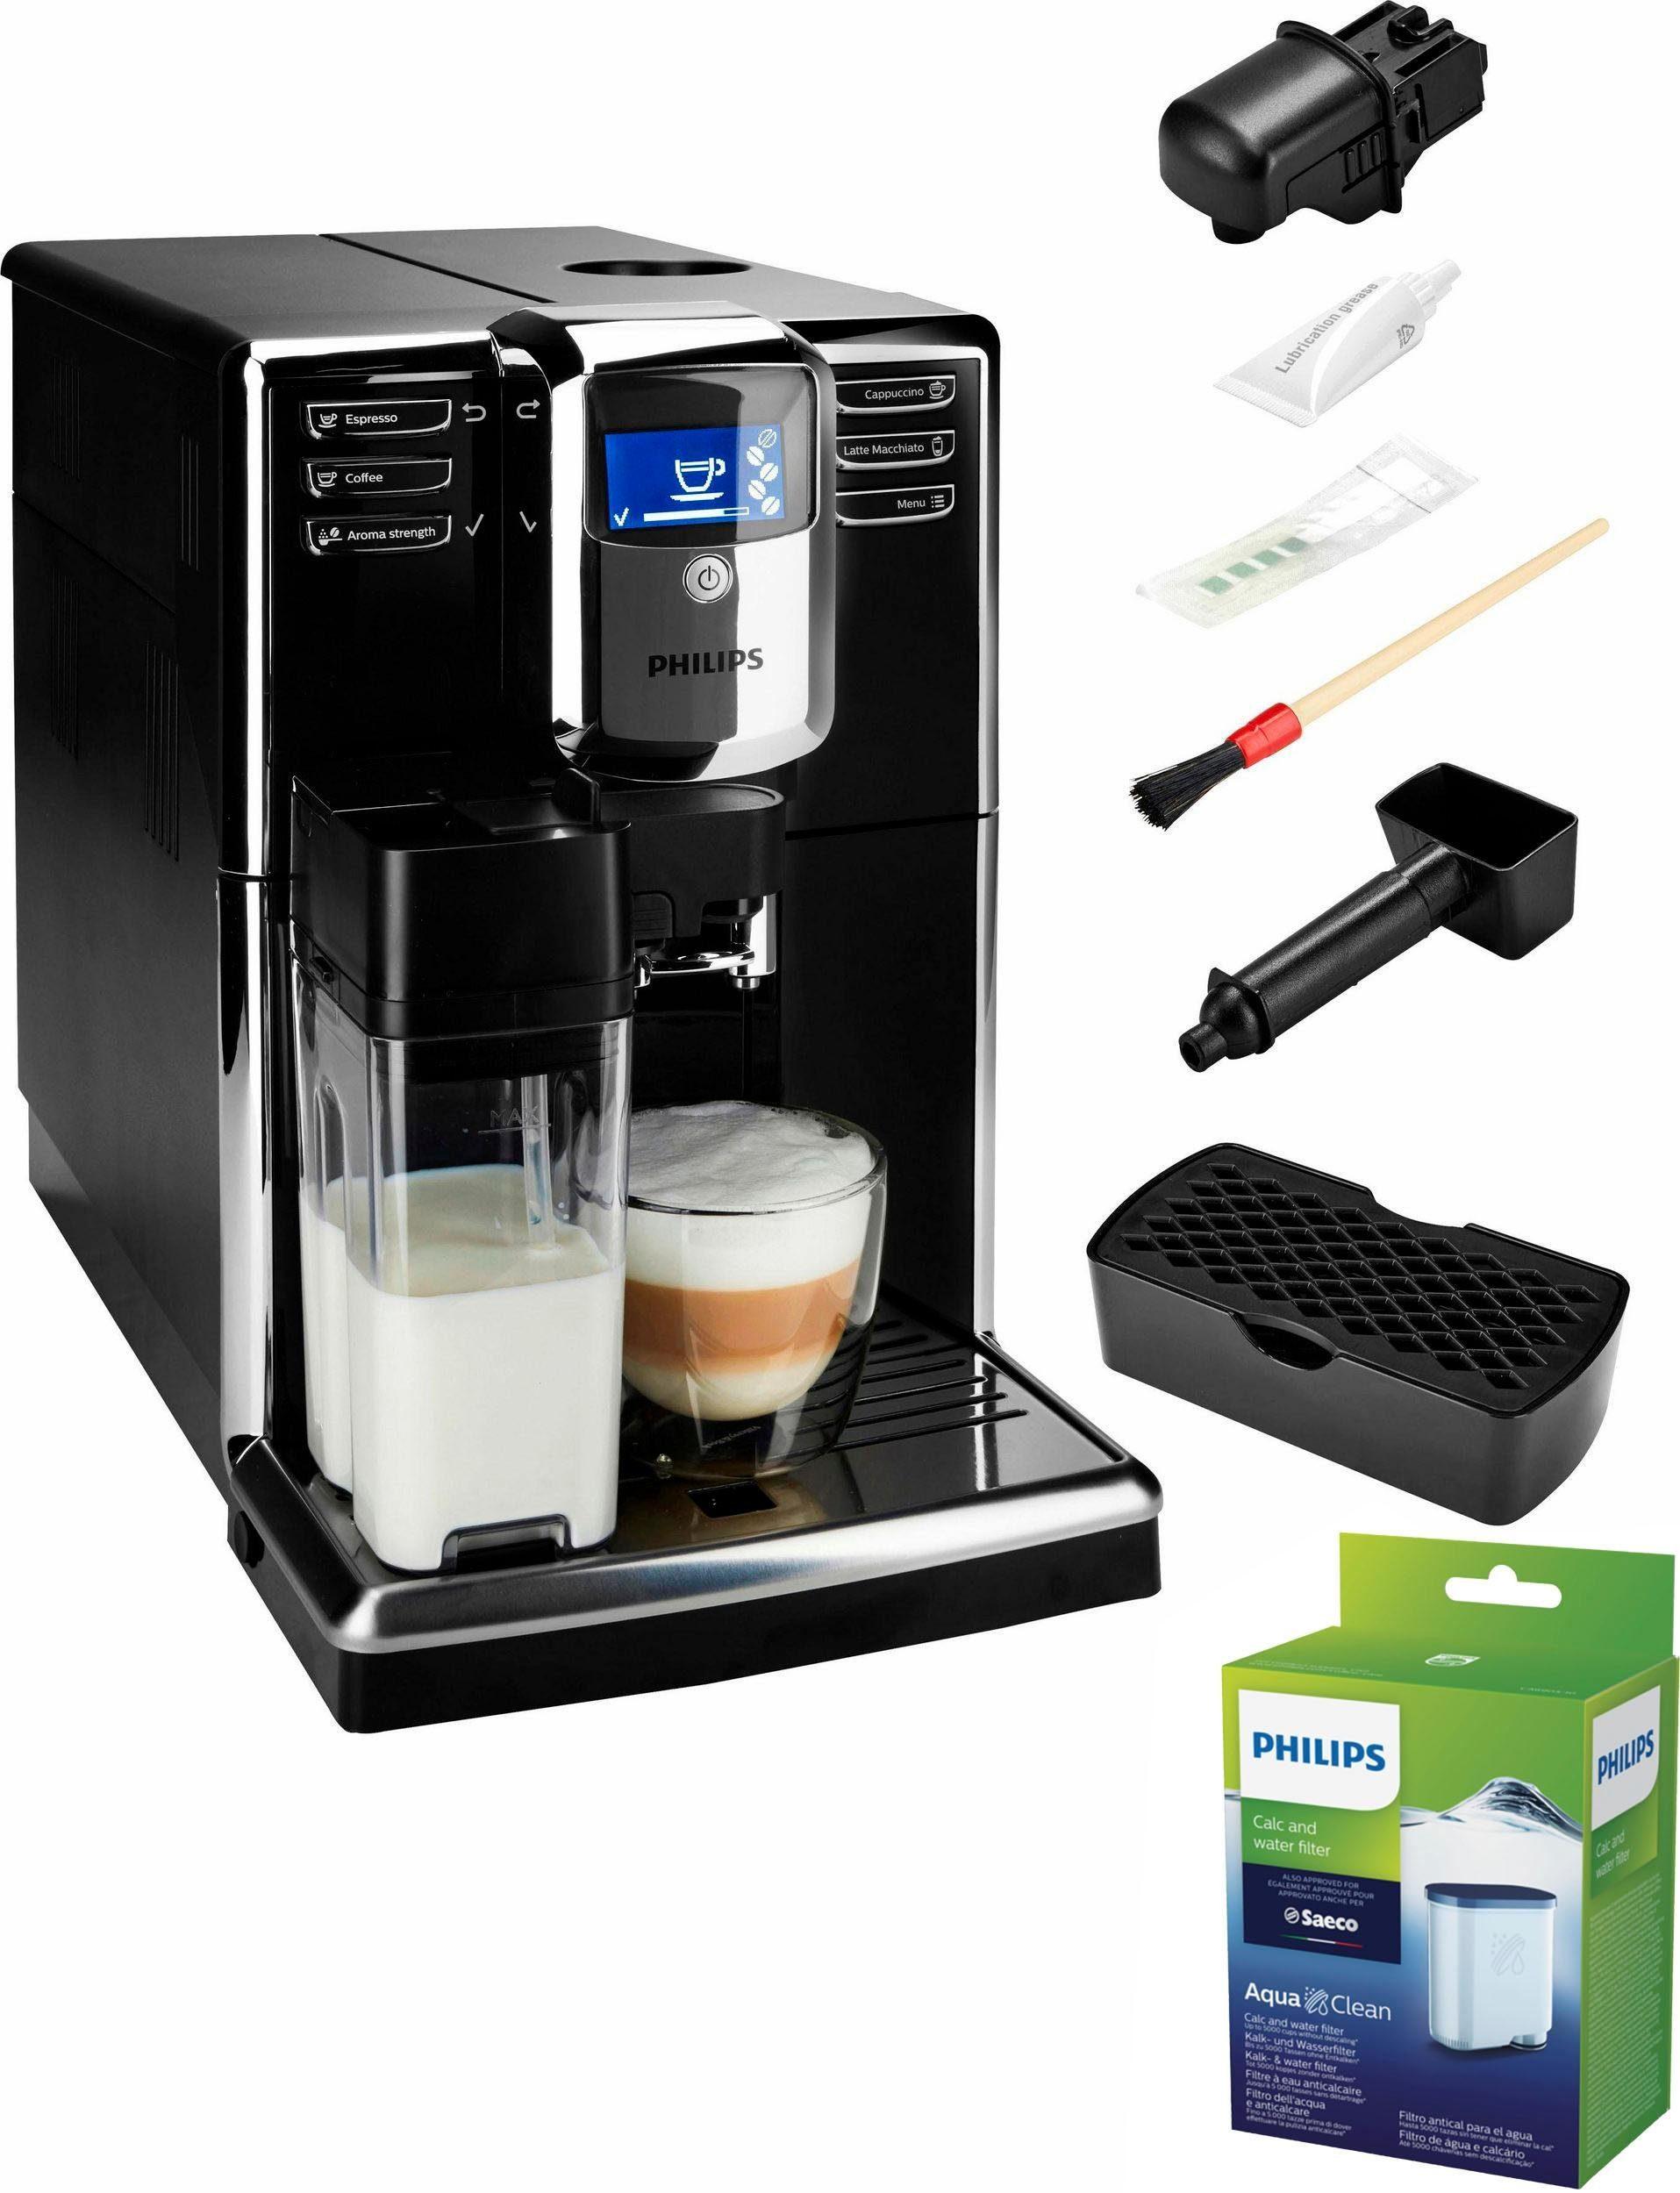 Philips EP5960 espresso machine dominokala 8 - اسپرسو ساز فیلیپس EP5960